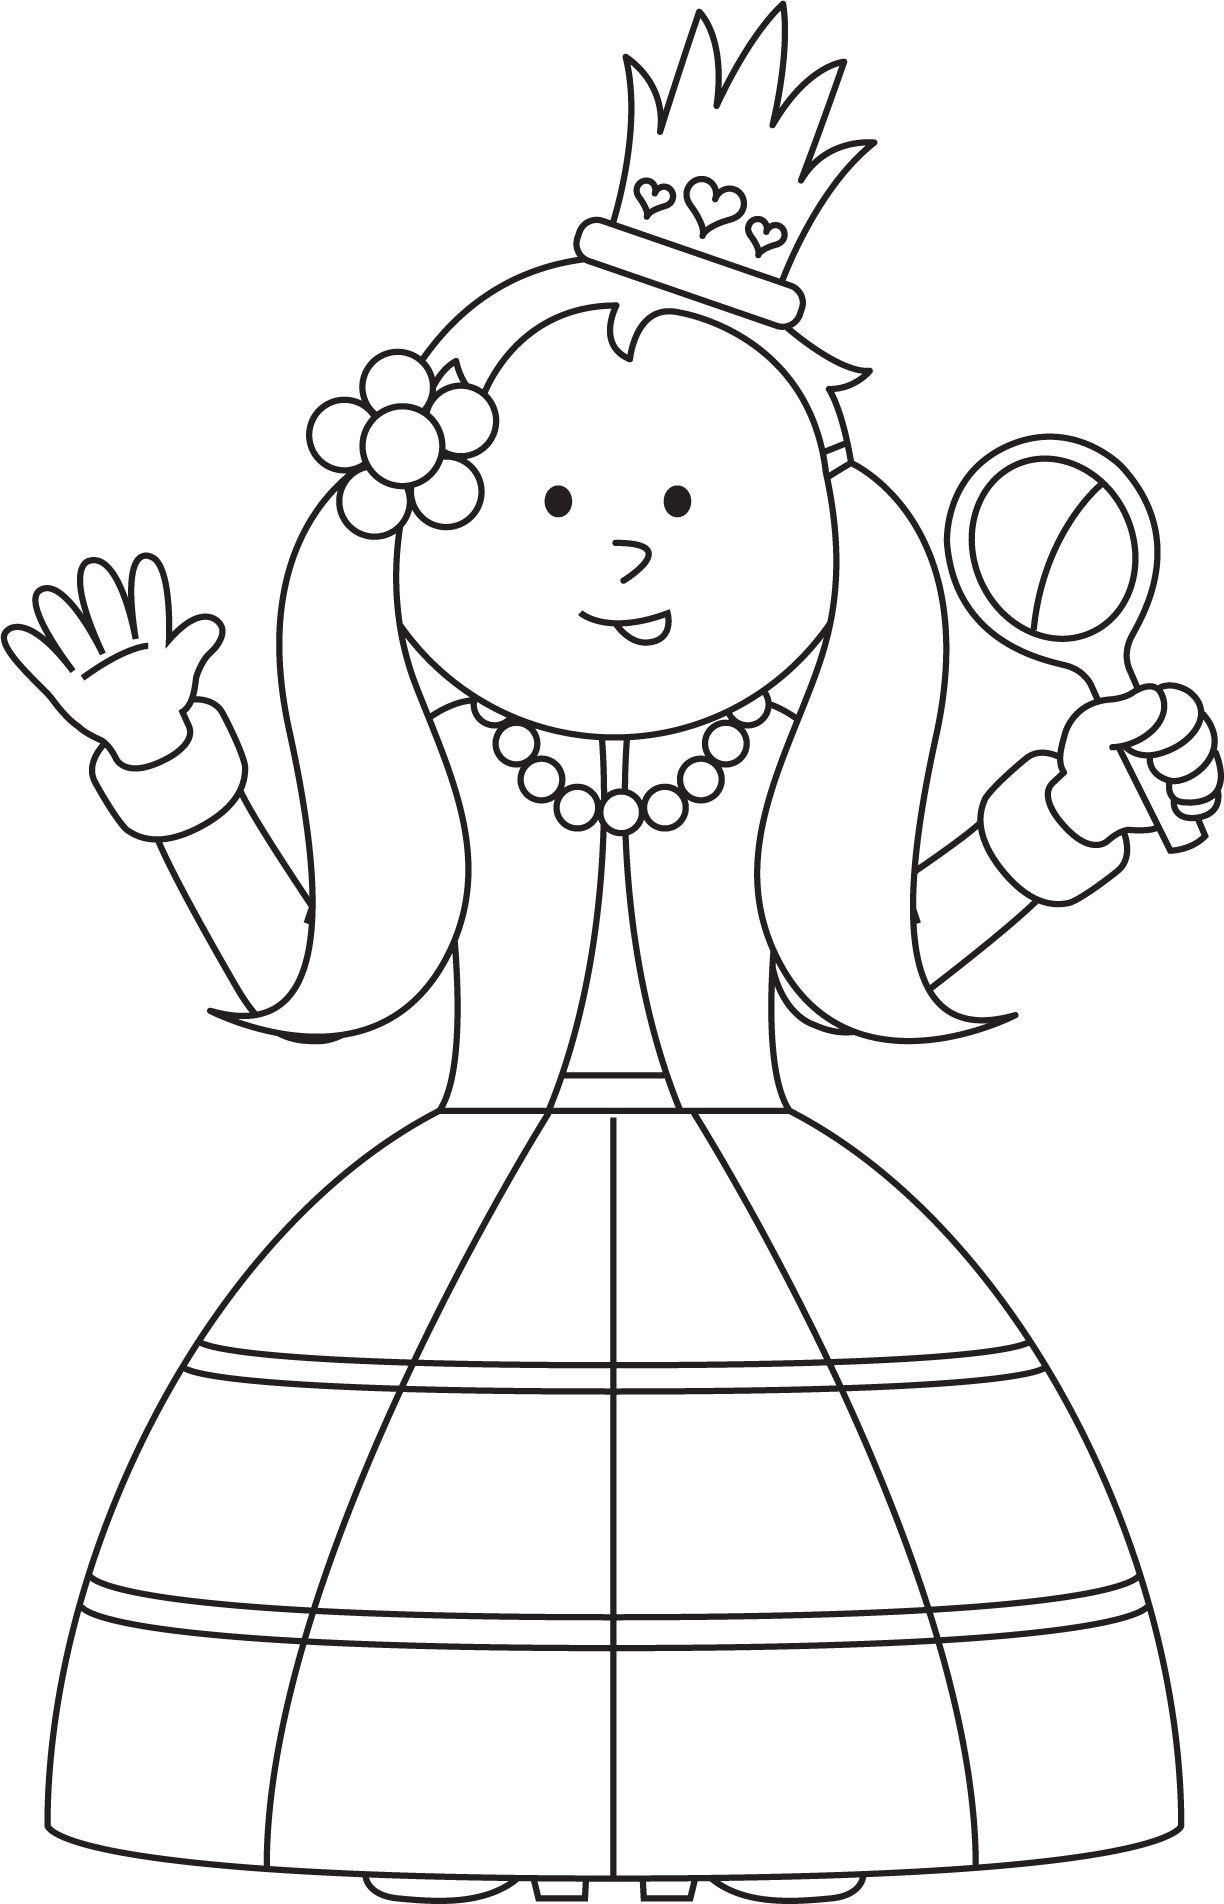 Prinsje En Prinsesje Google Zoeken Ridders Prinses Knutselen Prinsessen